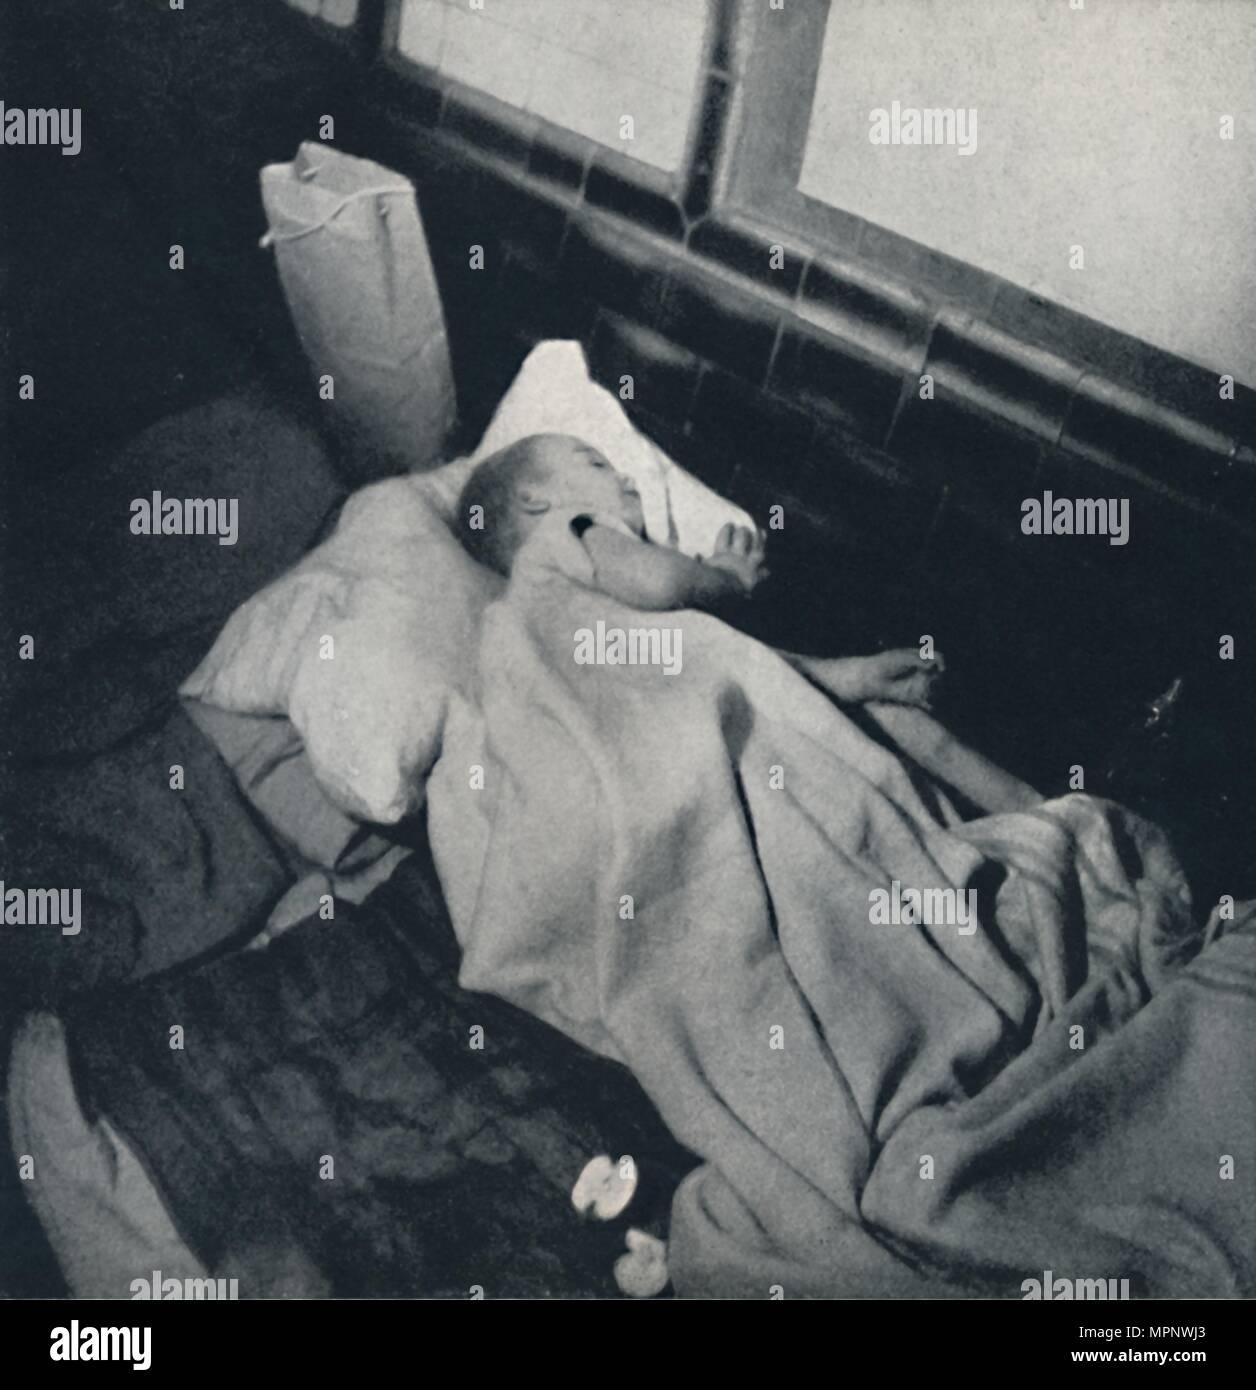 'Sleeping baby', 1941. Artist: Cecil Beaton. - Stock Image